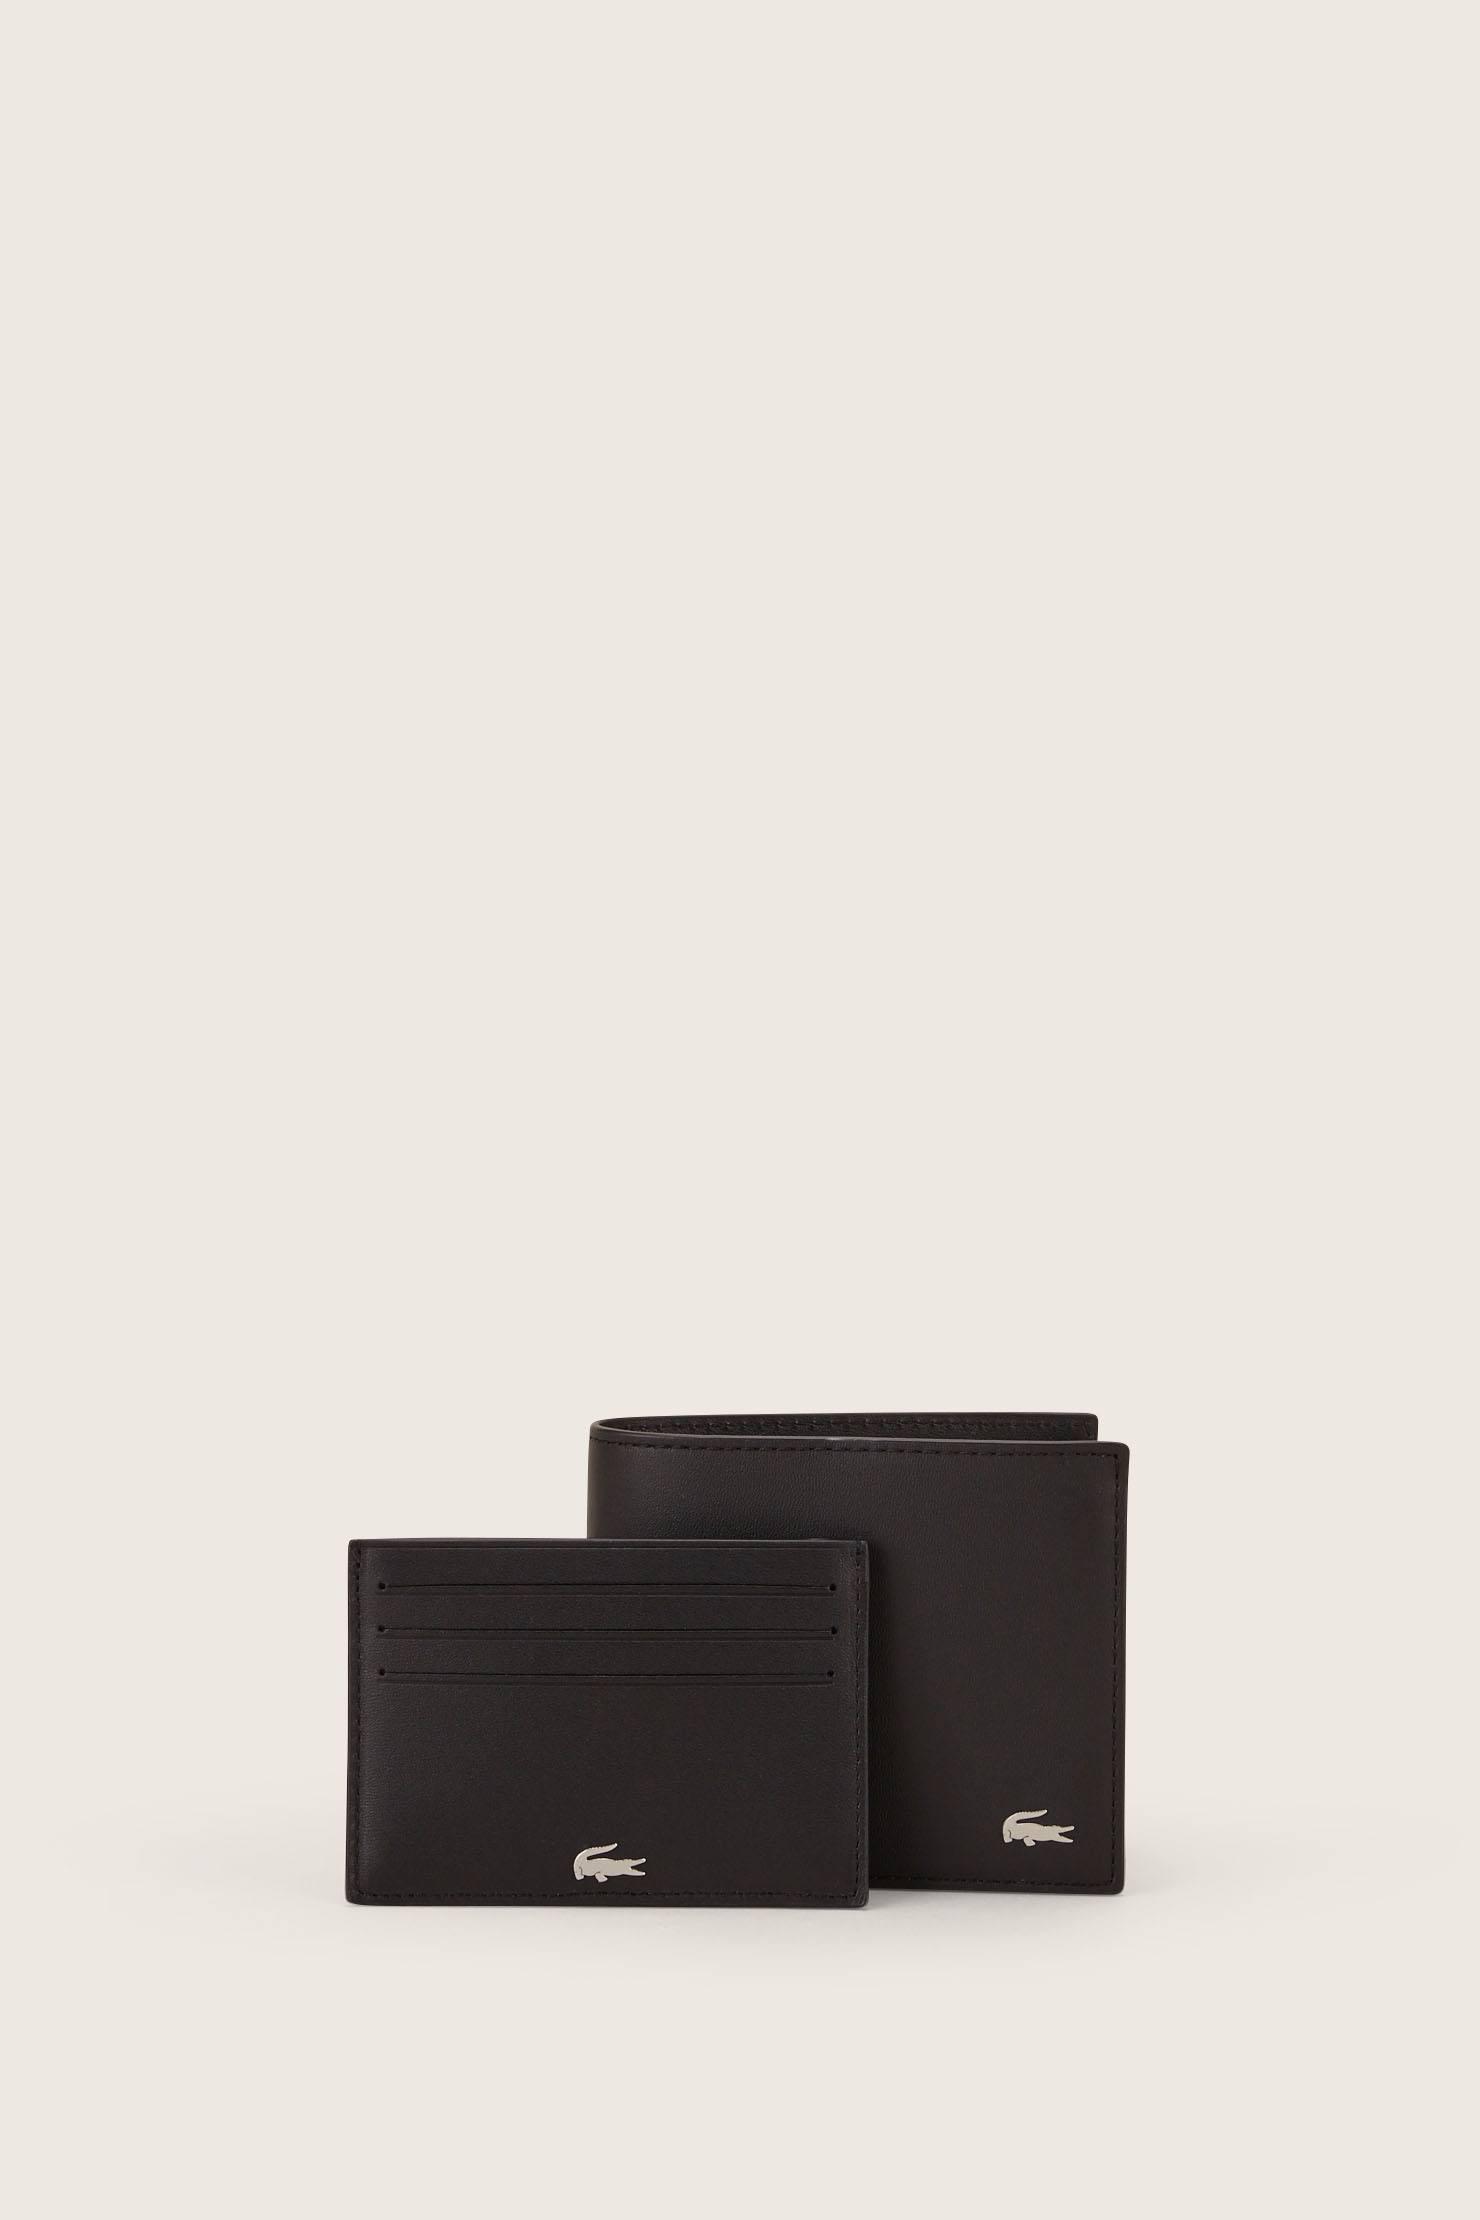 Lyst - Lacoste Business Card Holder in Black for Men